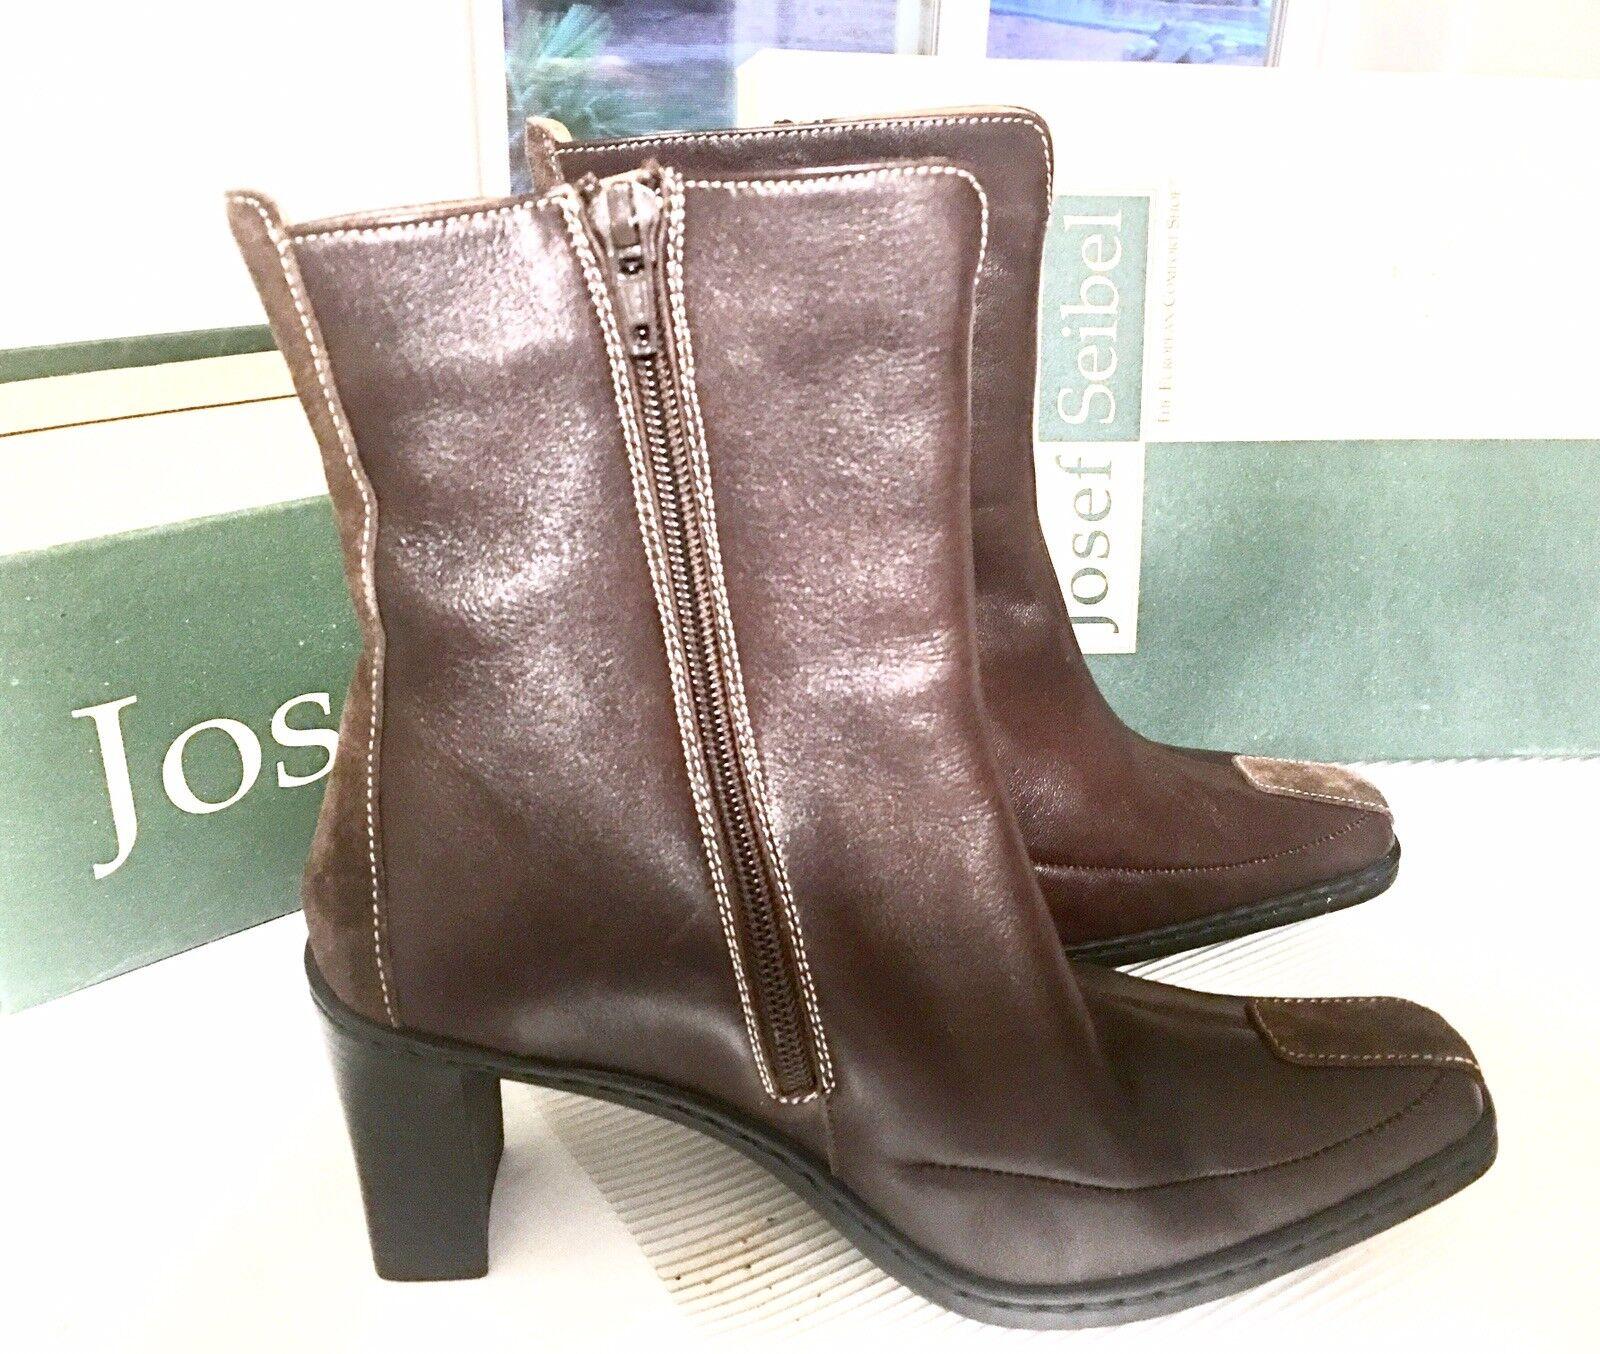 Josef Seibel donna Leather stivali Dimensione 6 1 2 (Narrow) Ankle stivali New